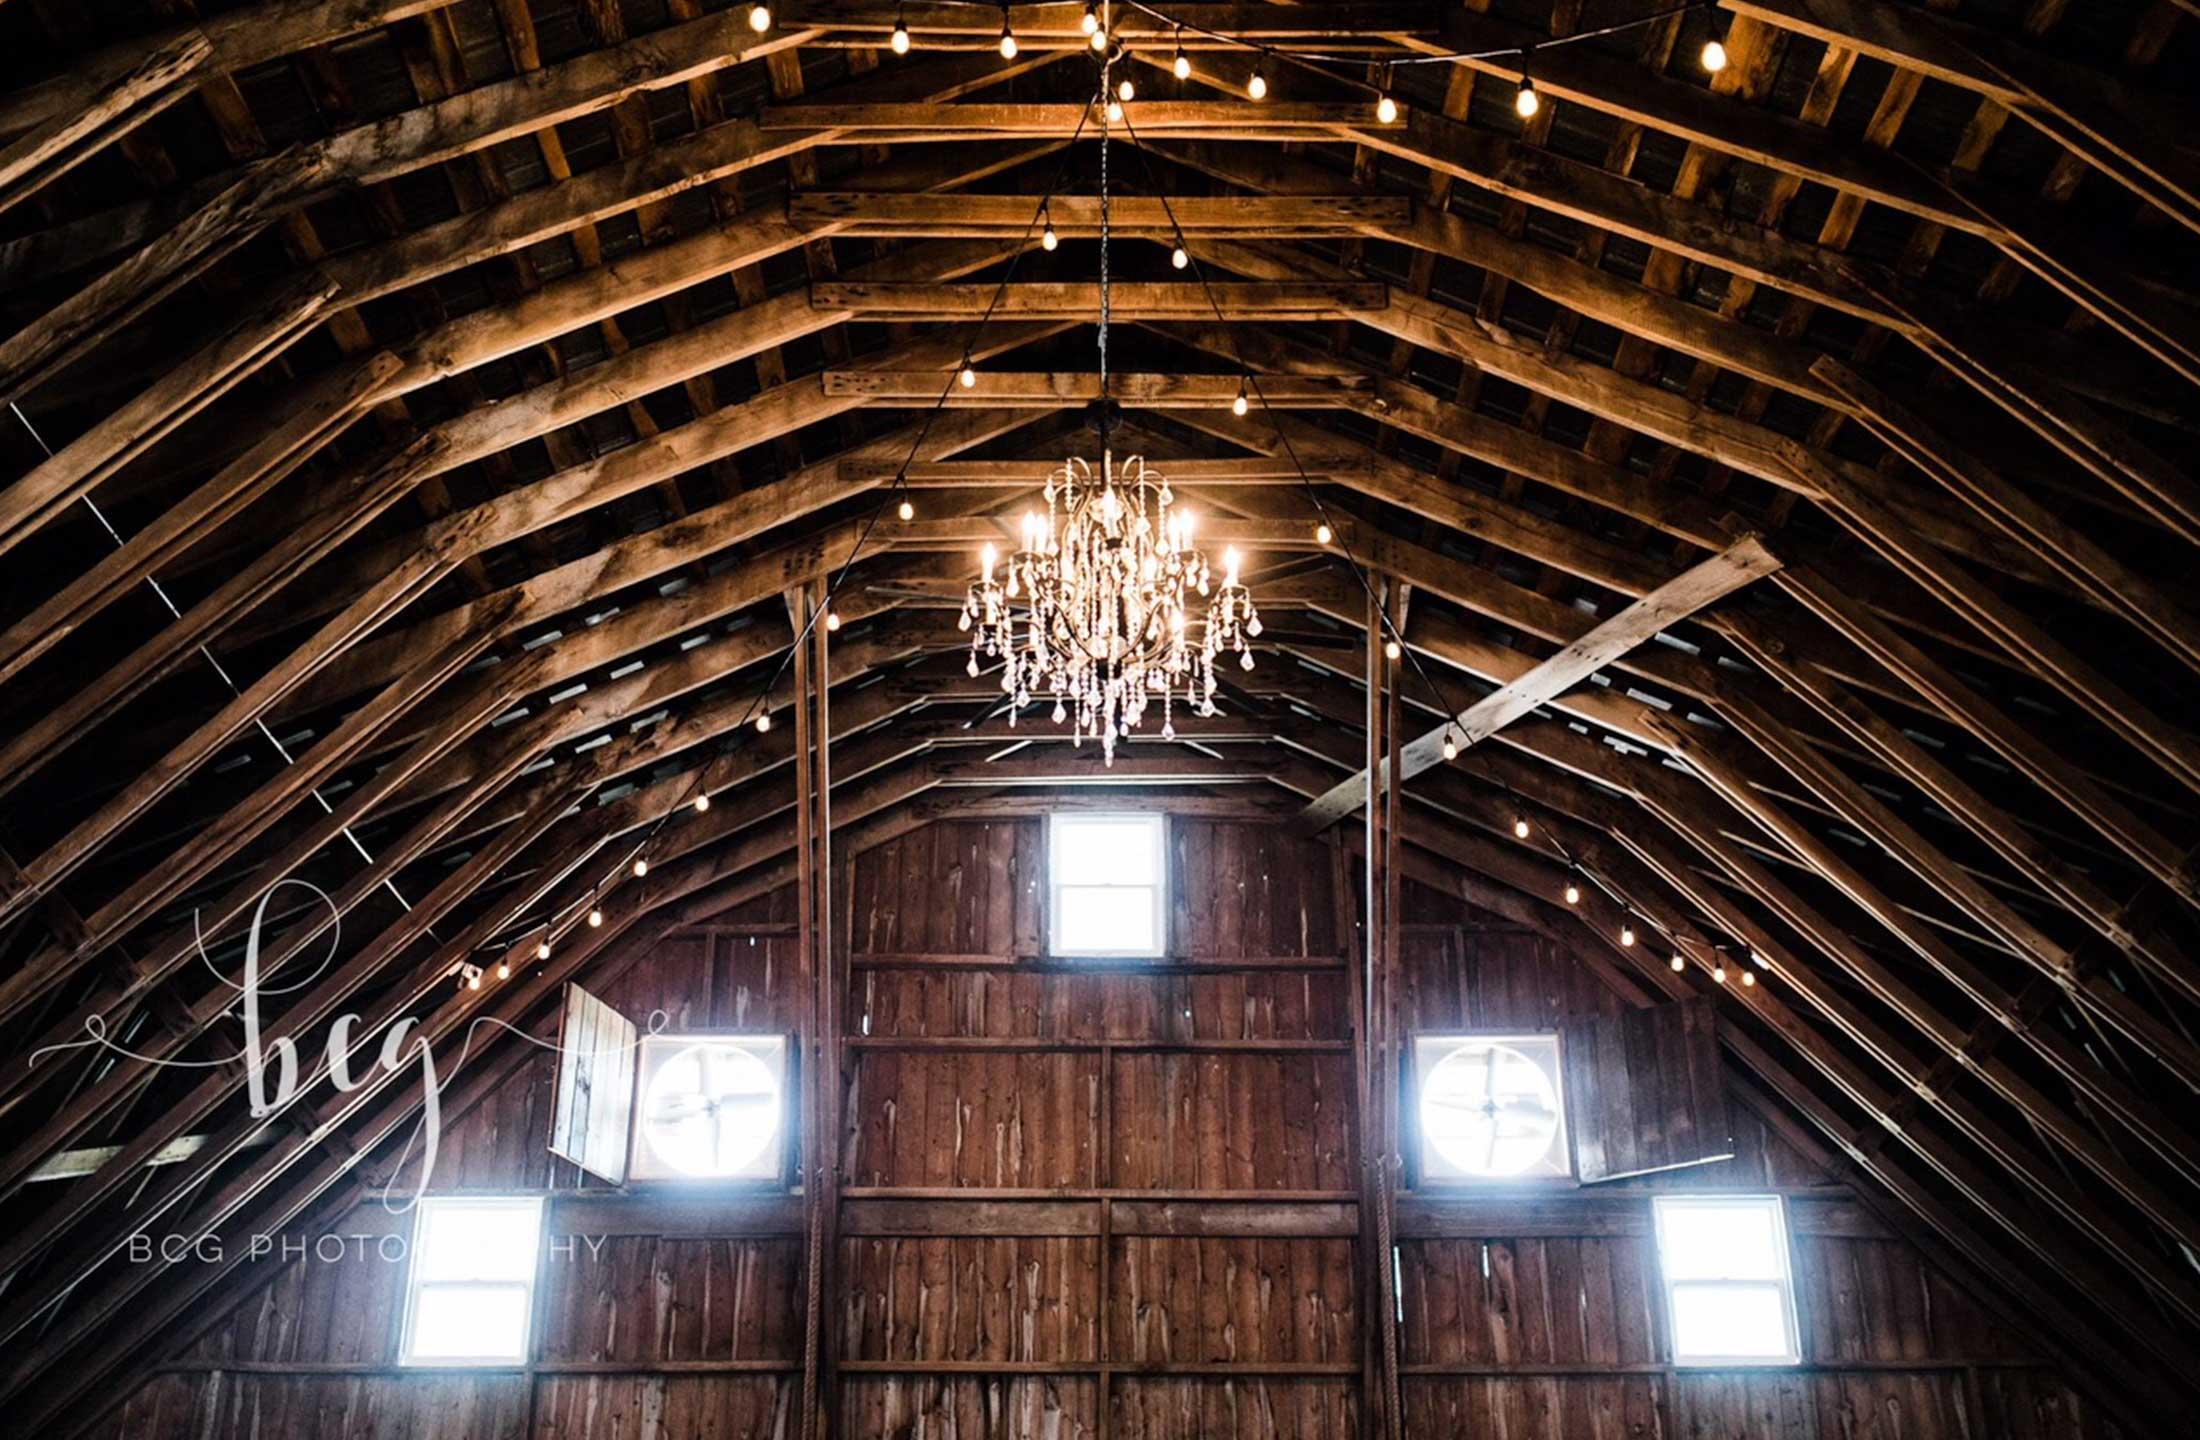 White Birch Barn Wedding Event Venue In Medina Oh